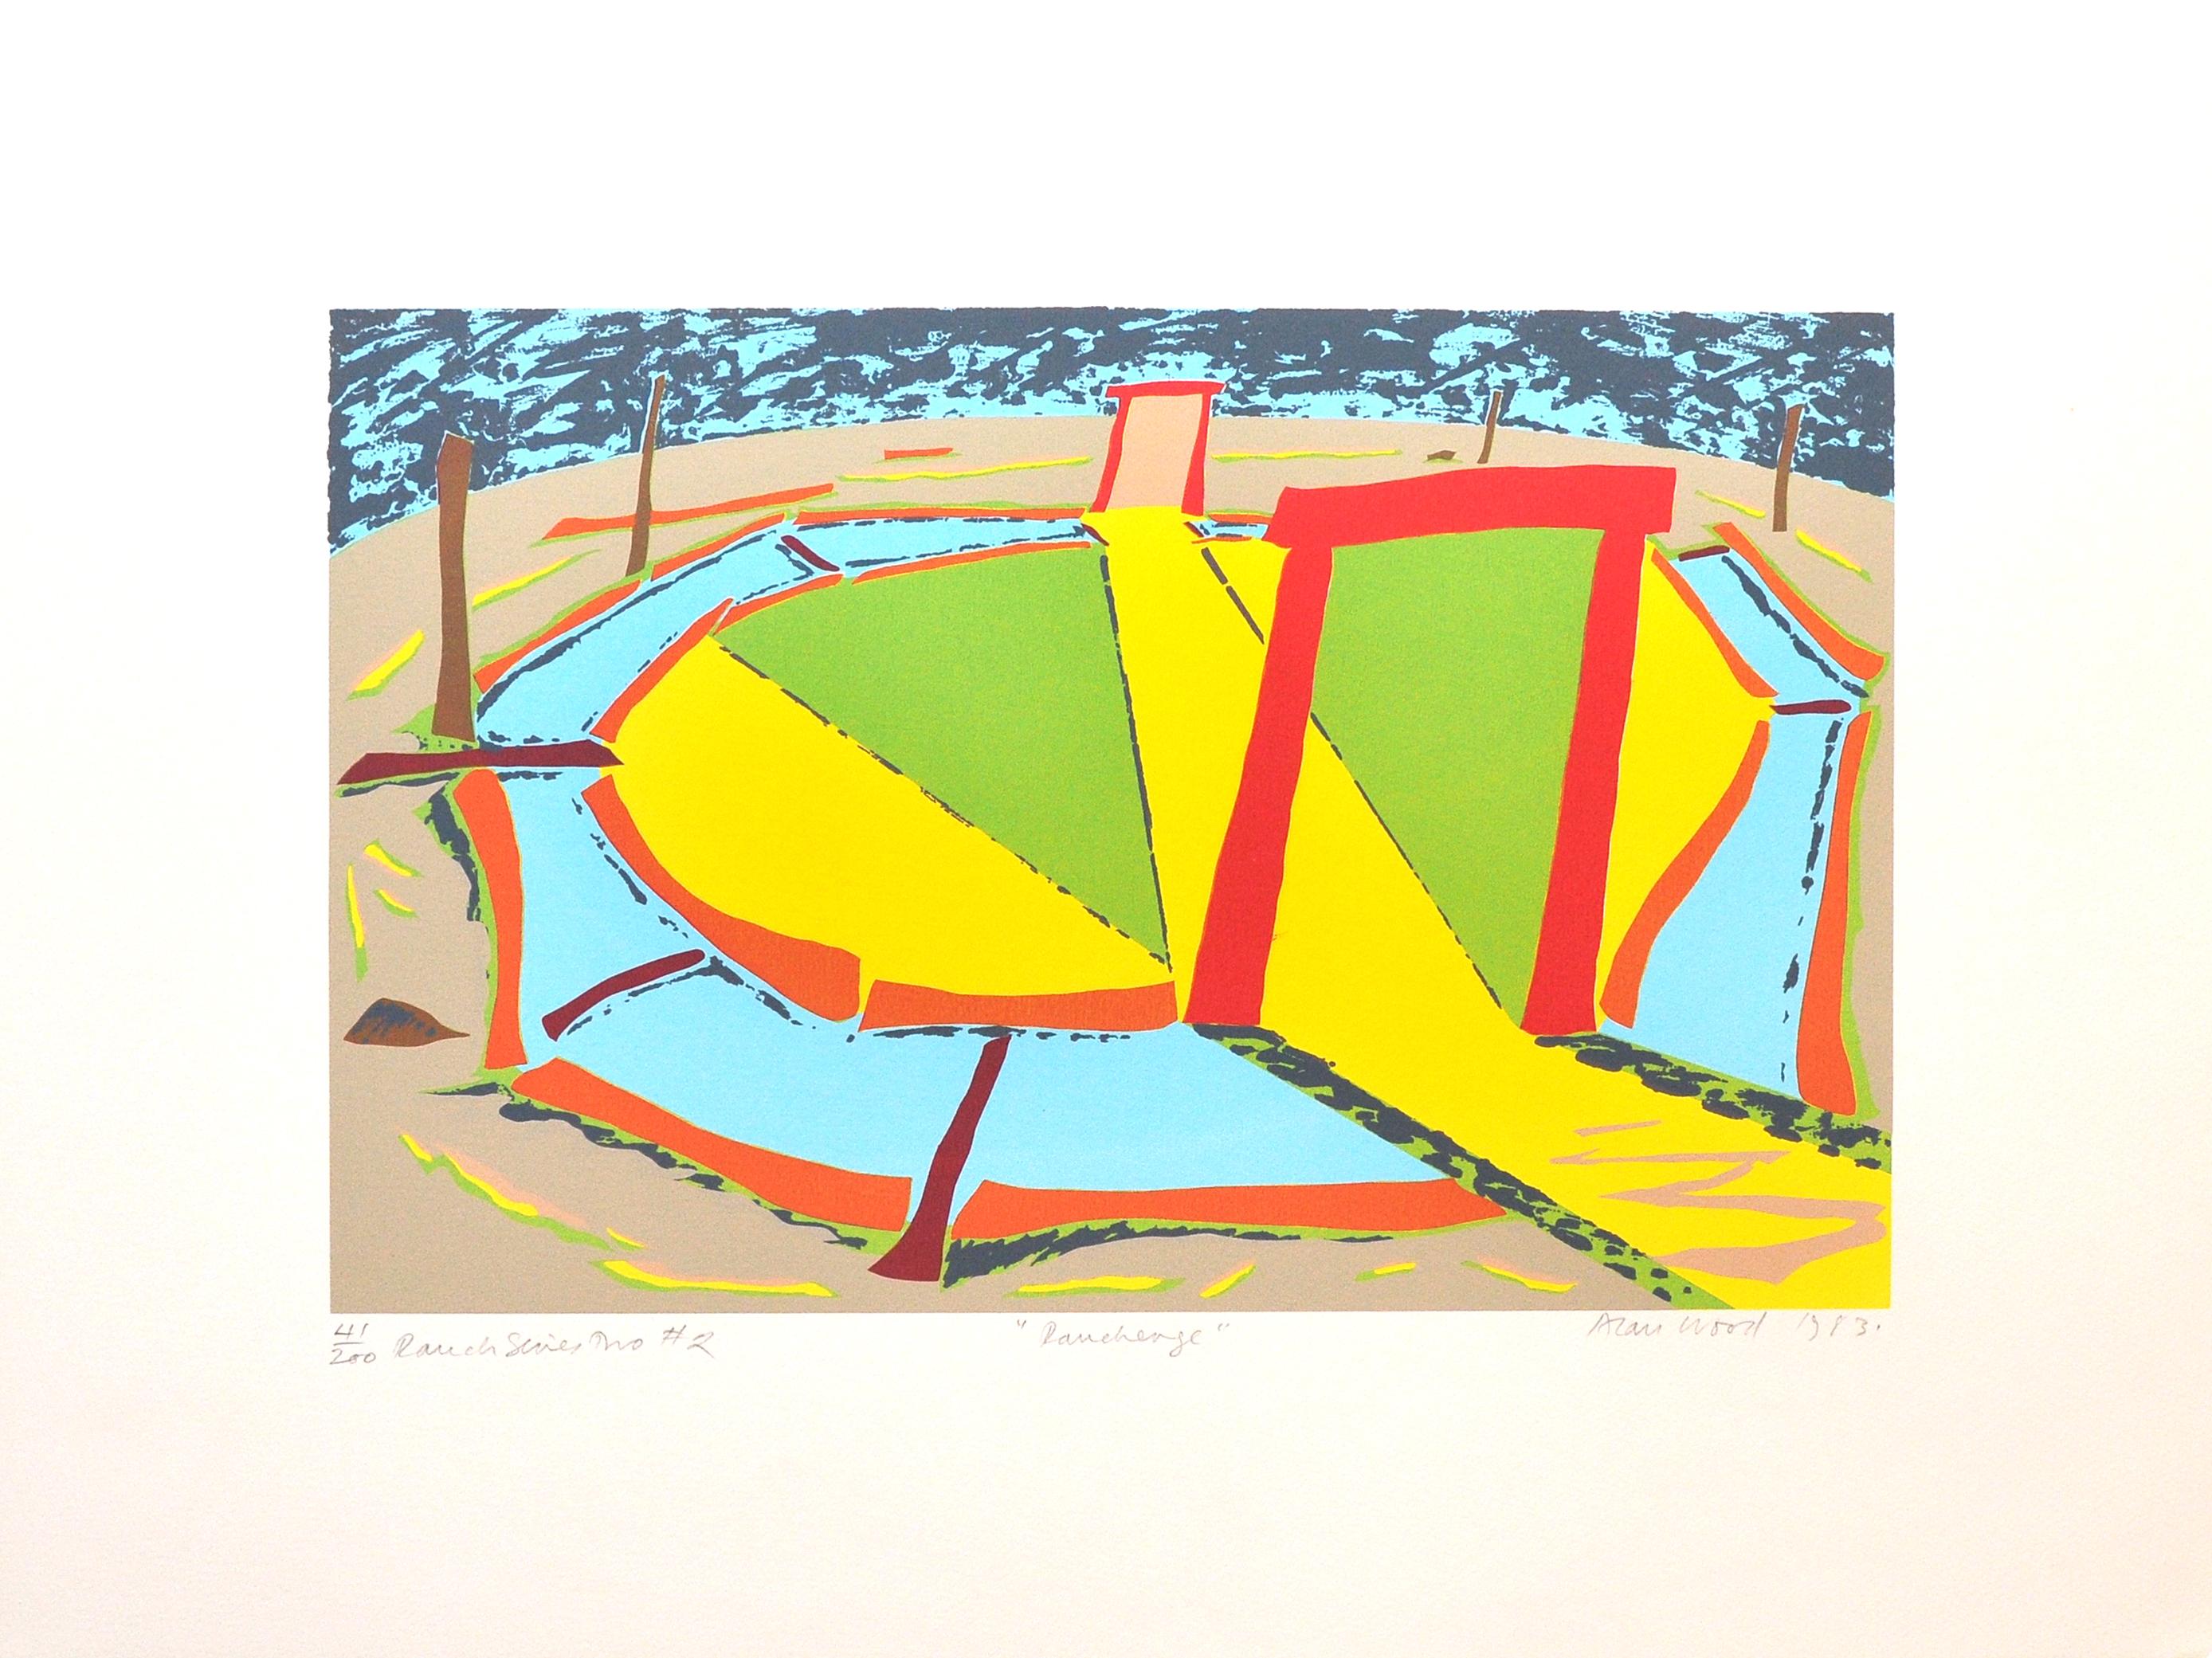 Alan_Woods_1983_Prints_#41_RanchSeriesTwo#2_Ranchenge